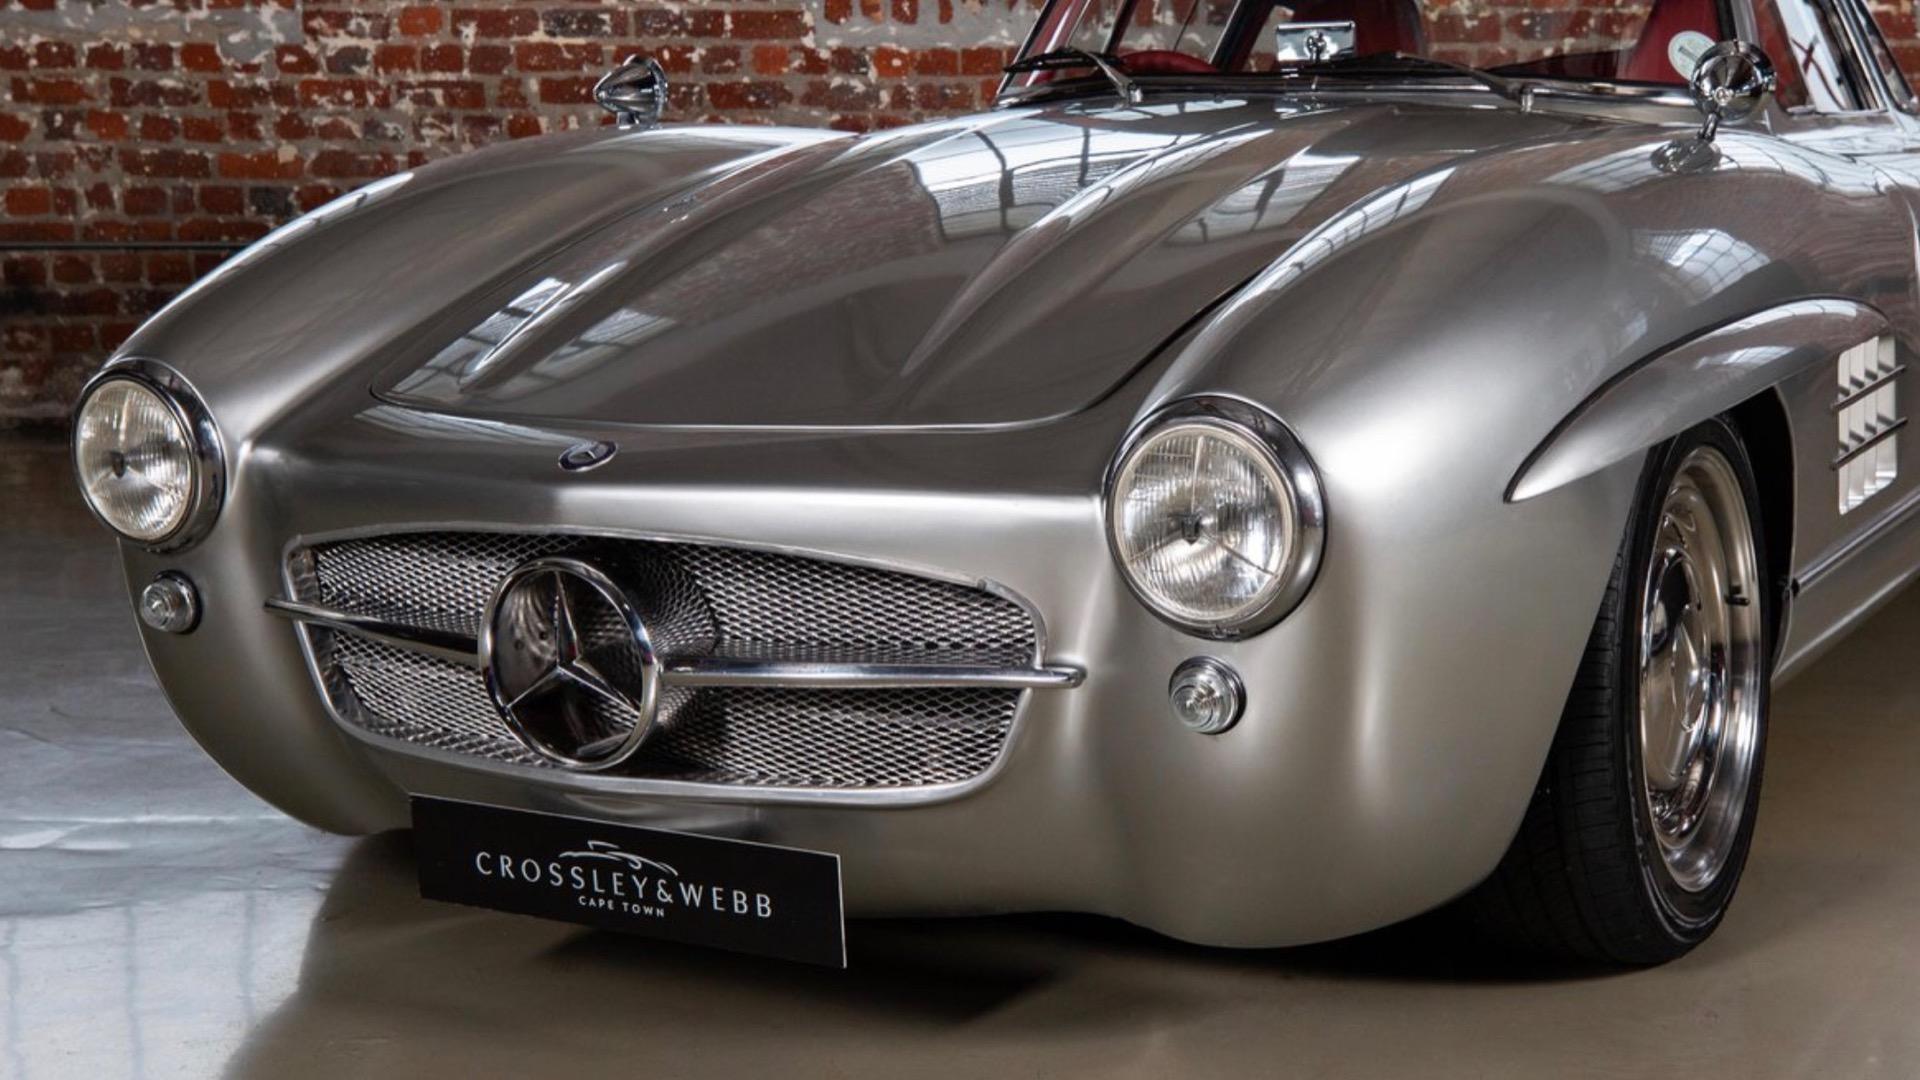 Mercedes benz 300sl gullwing replica photo by crossley webb 100792407 h